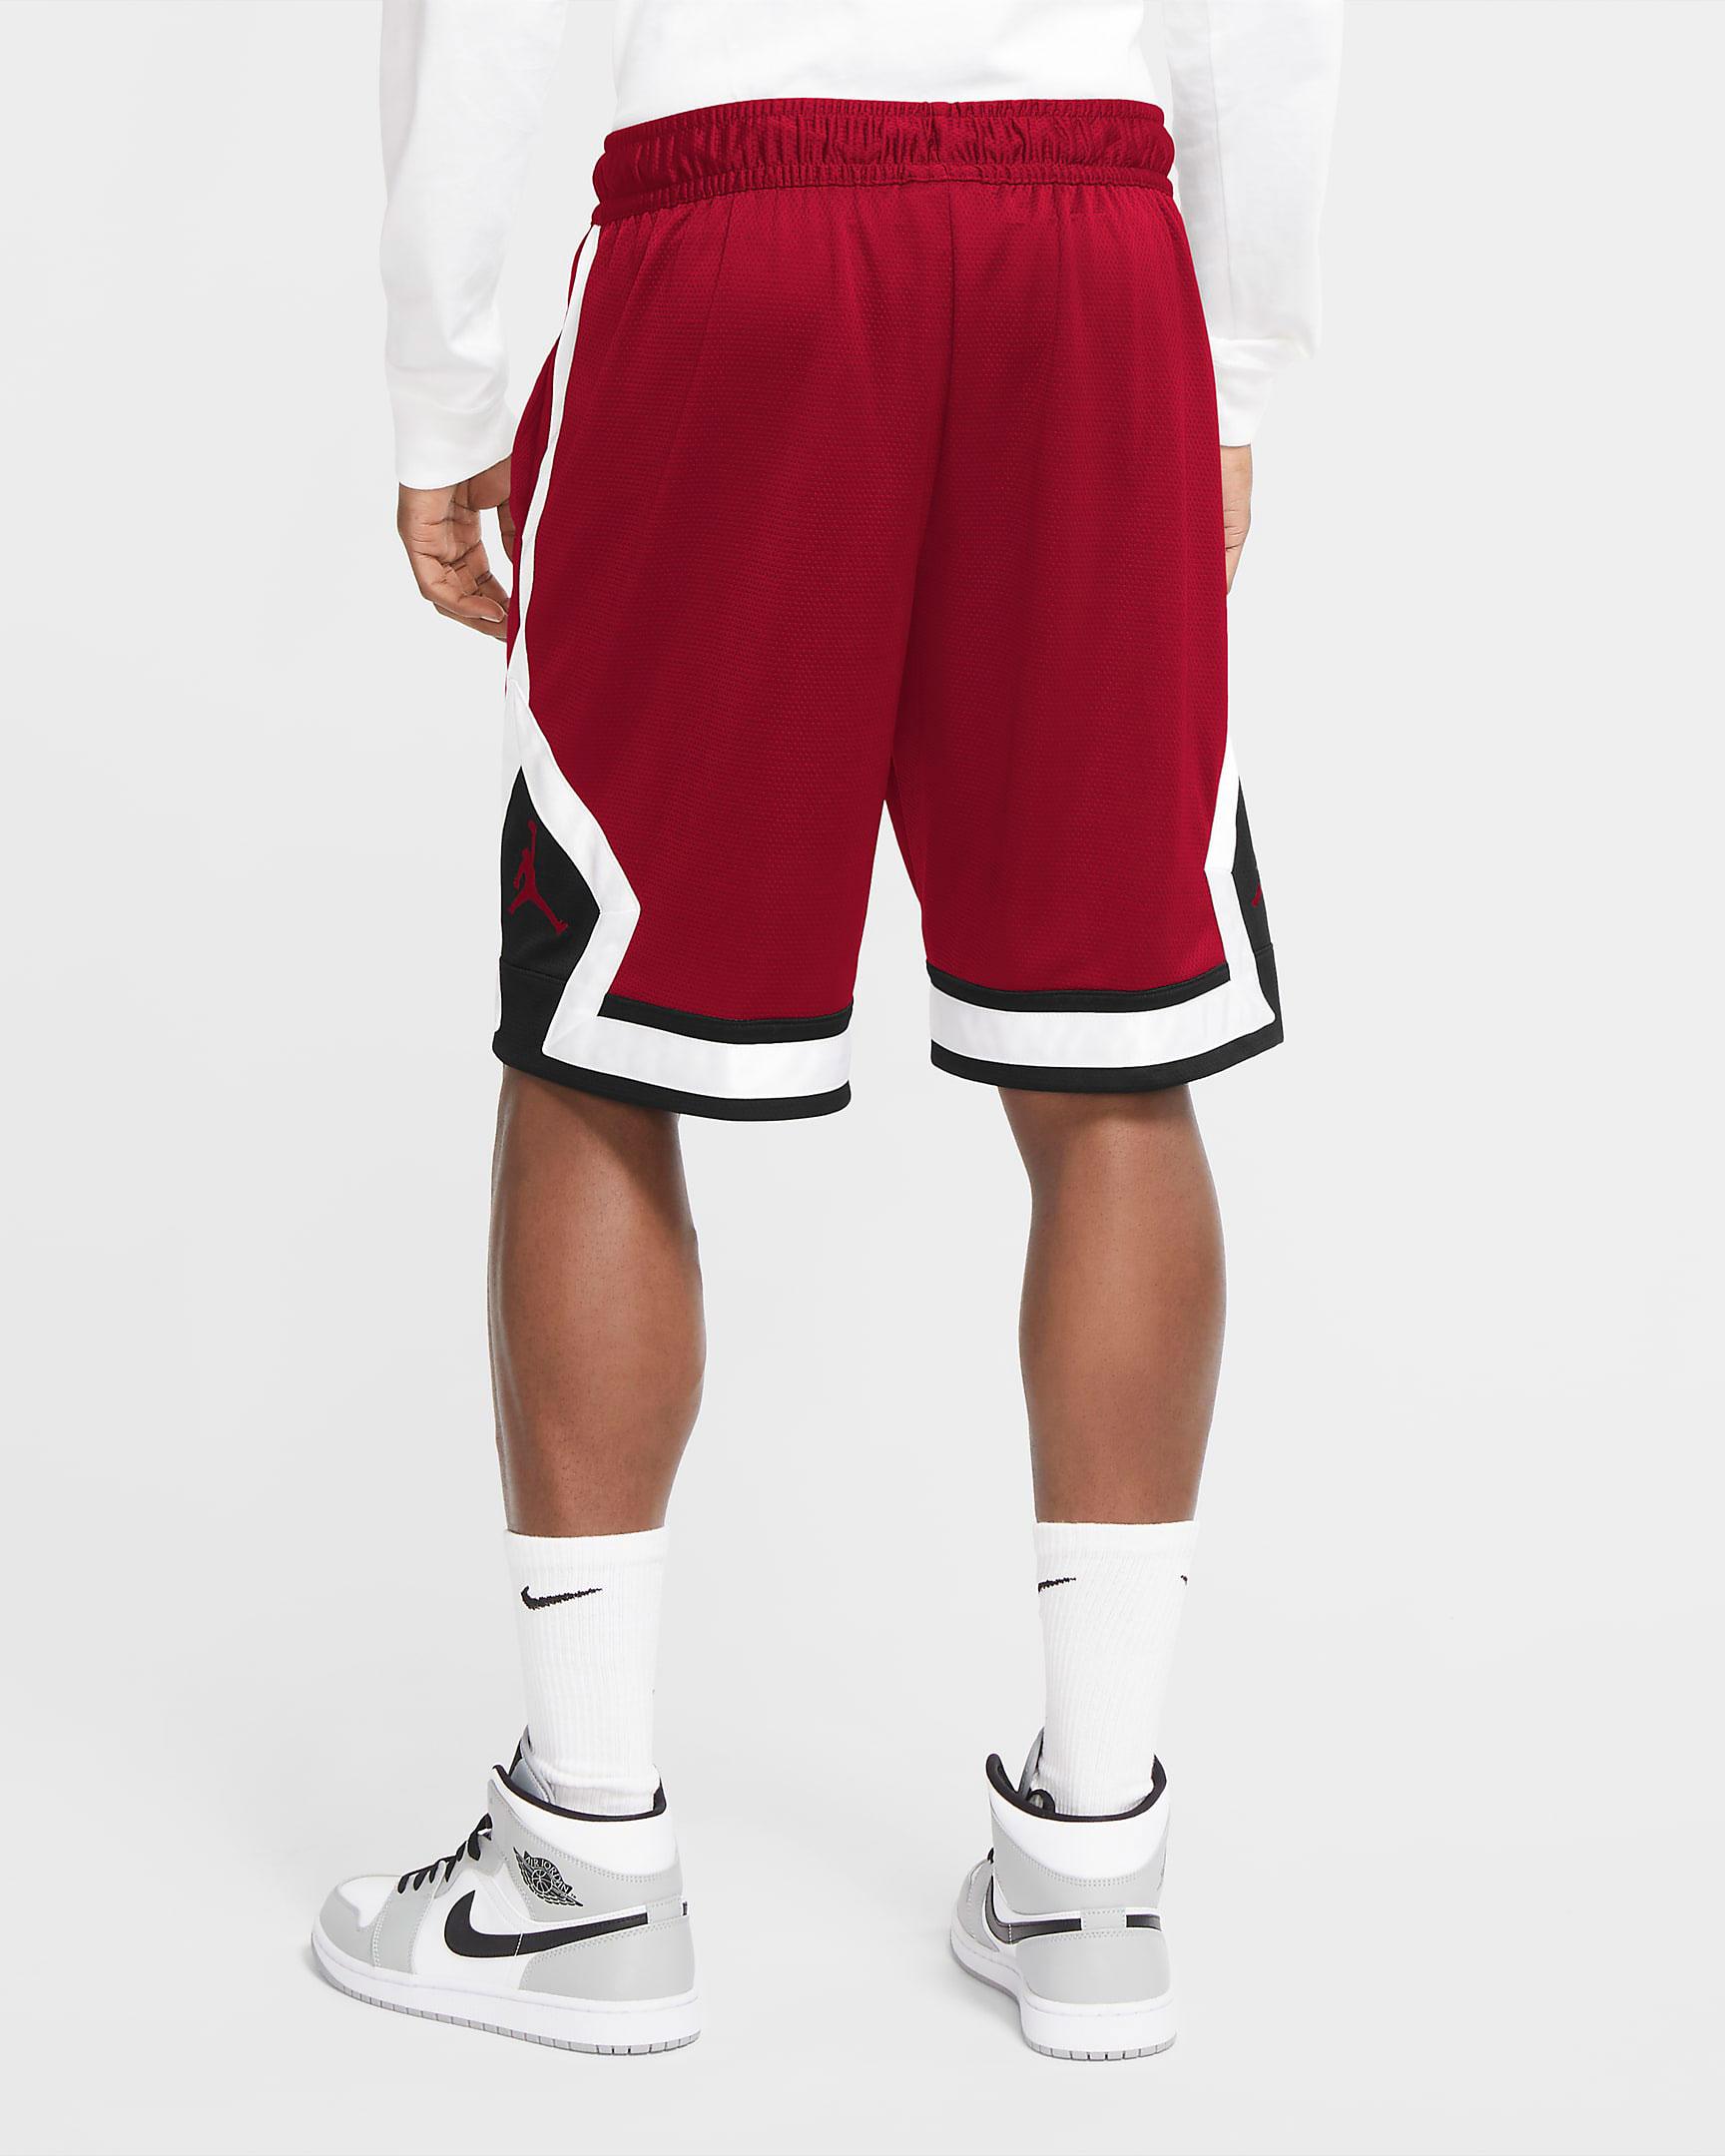 jordan-jumpman-diamond-shorts-gym-red-black-white-2